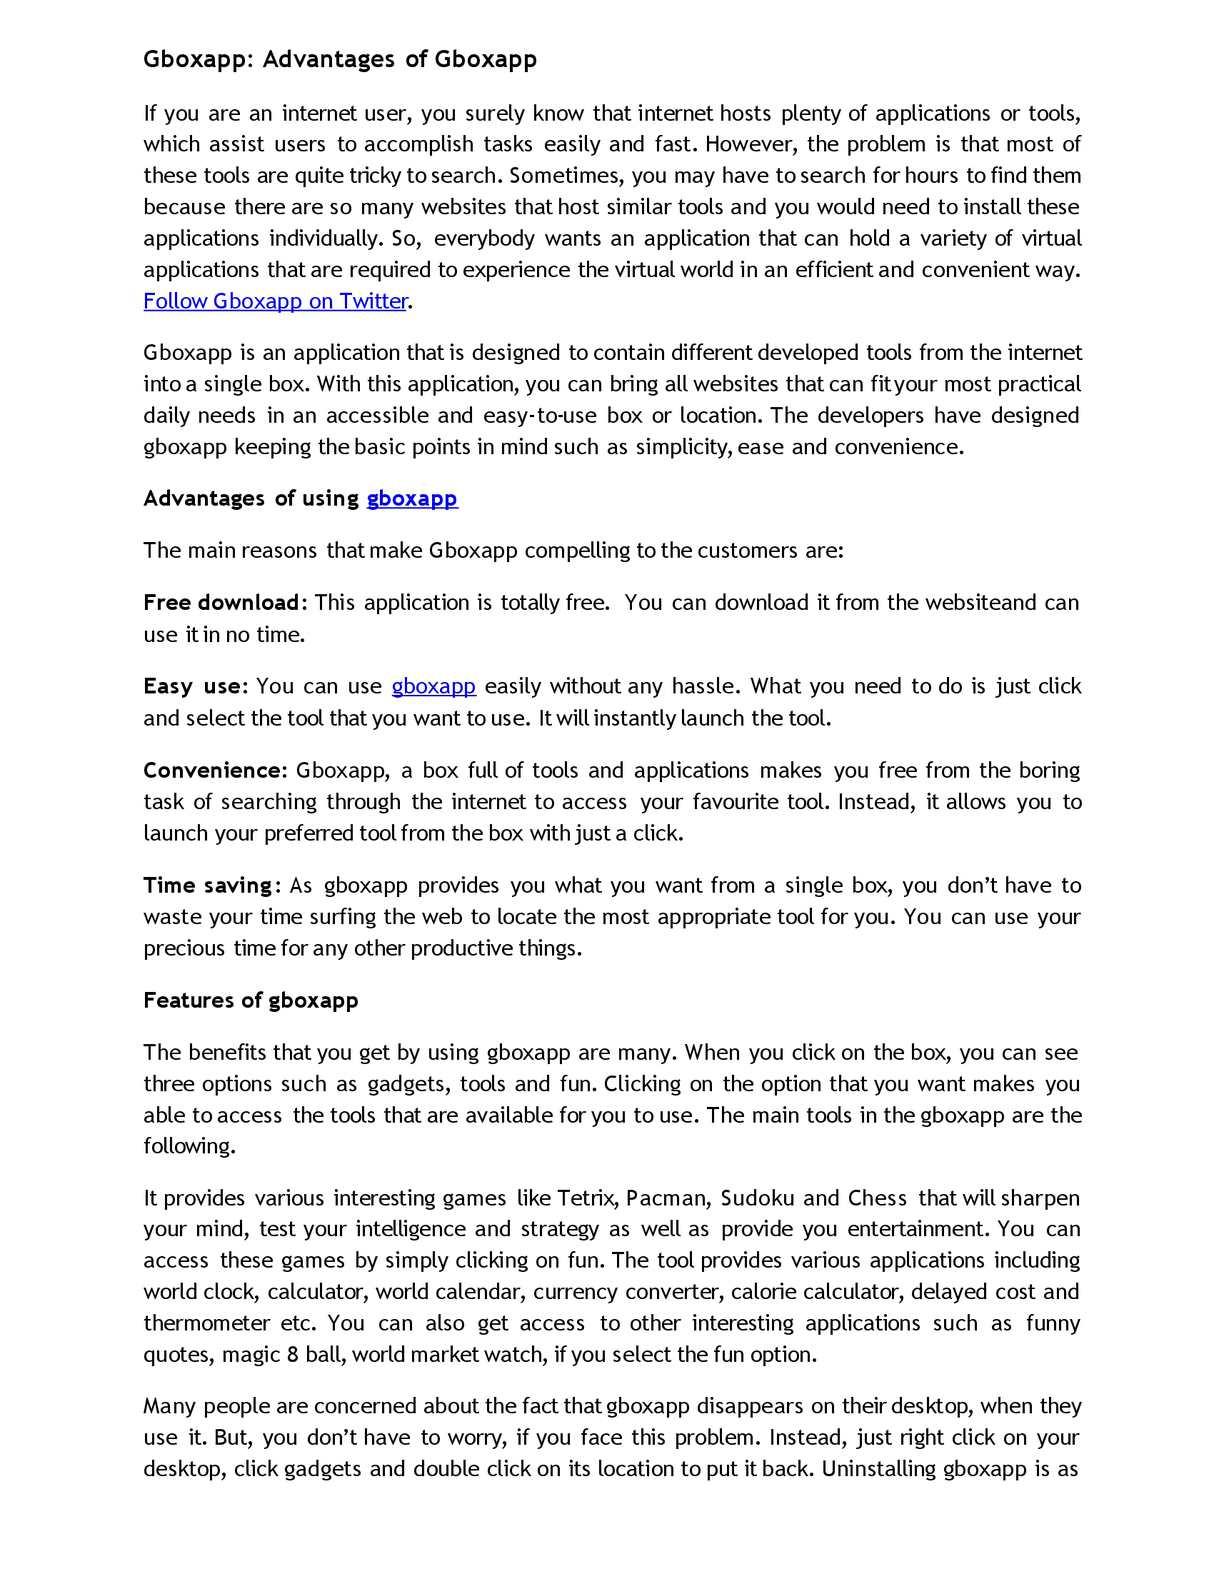 Calaméo - Gboxapp: Advantages of Gboxapp